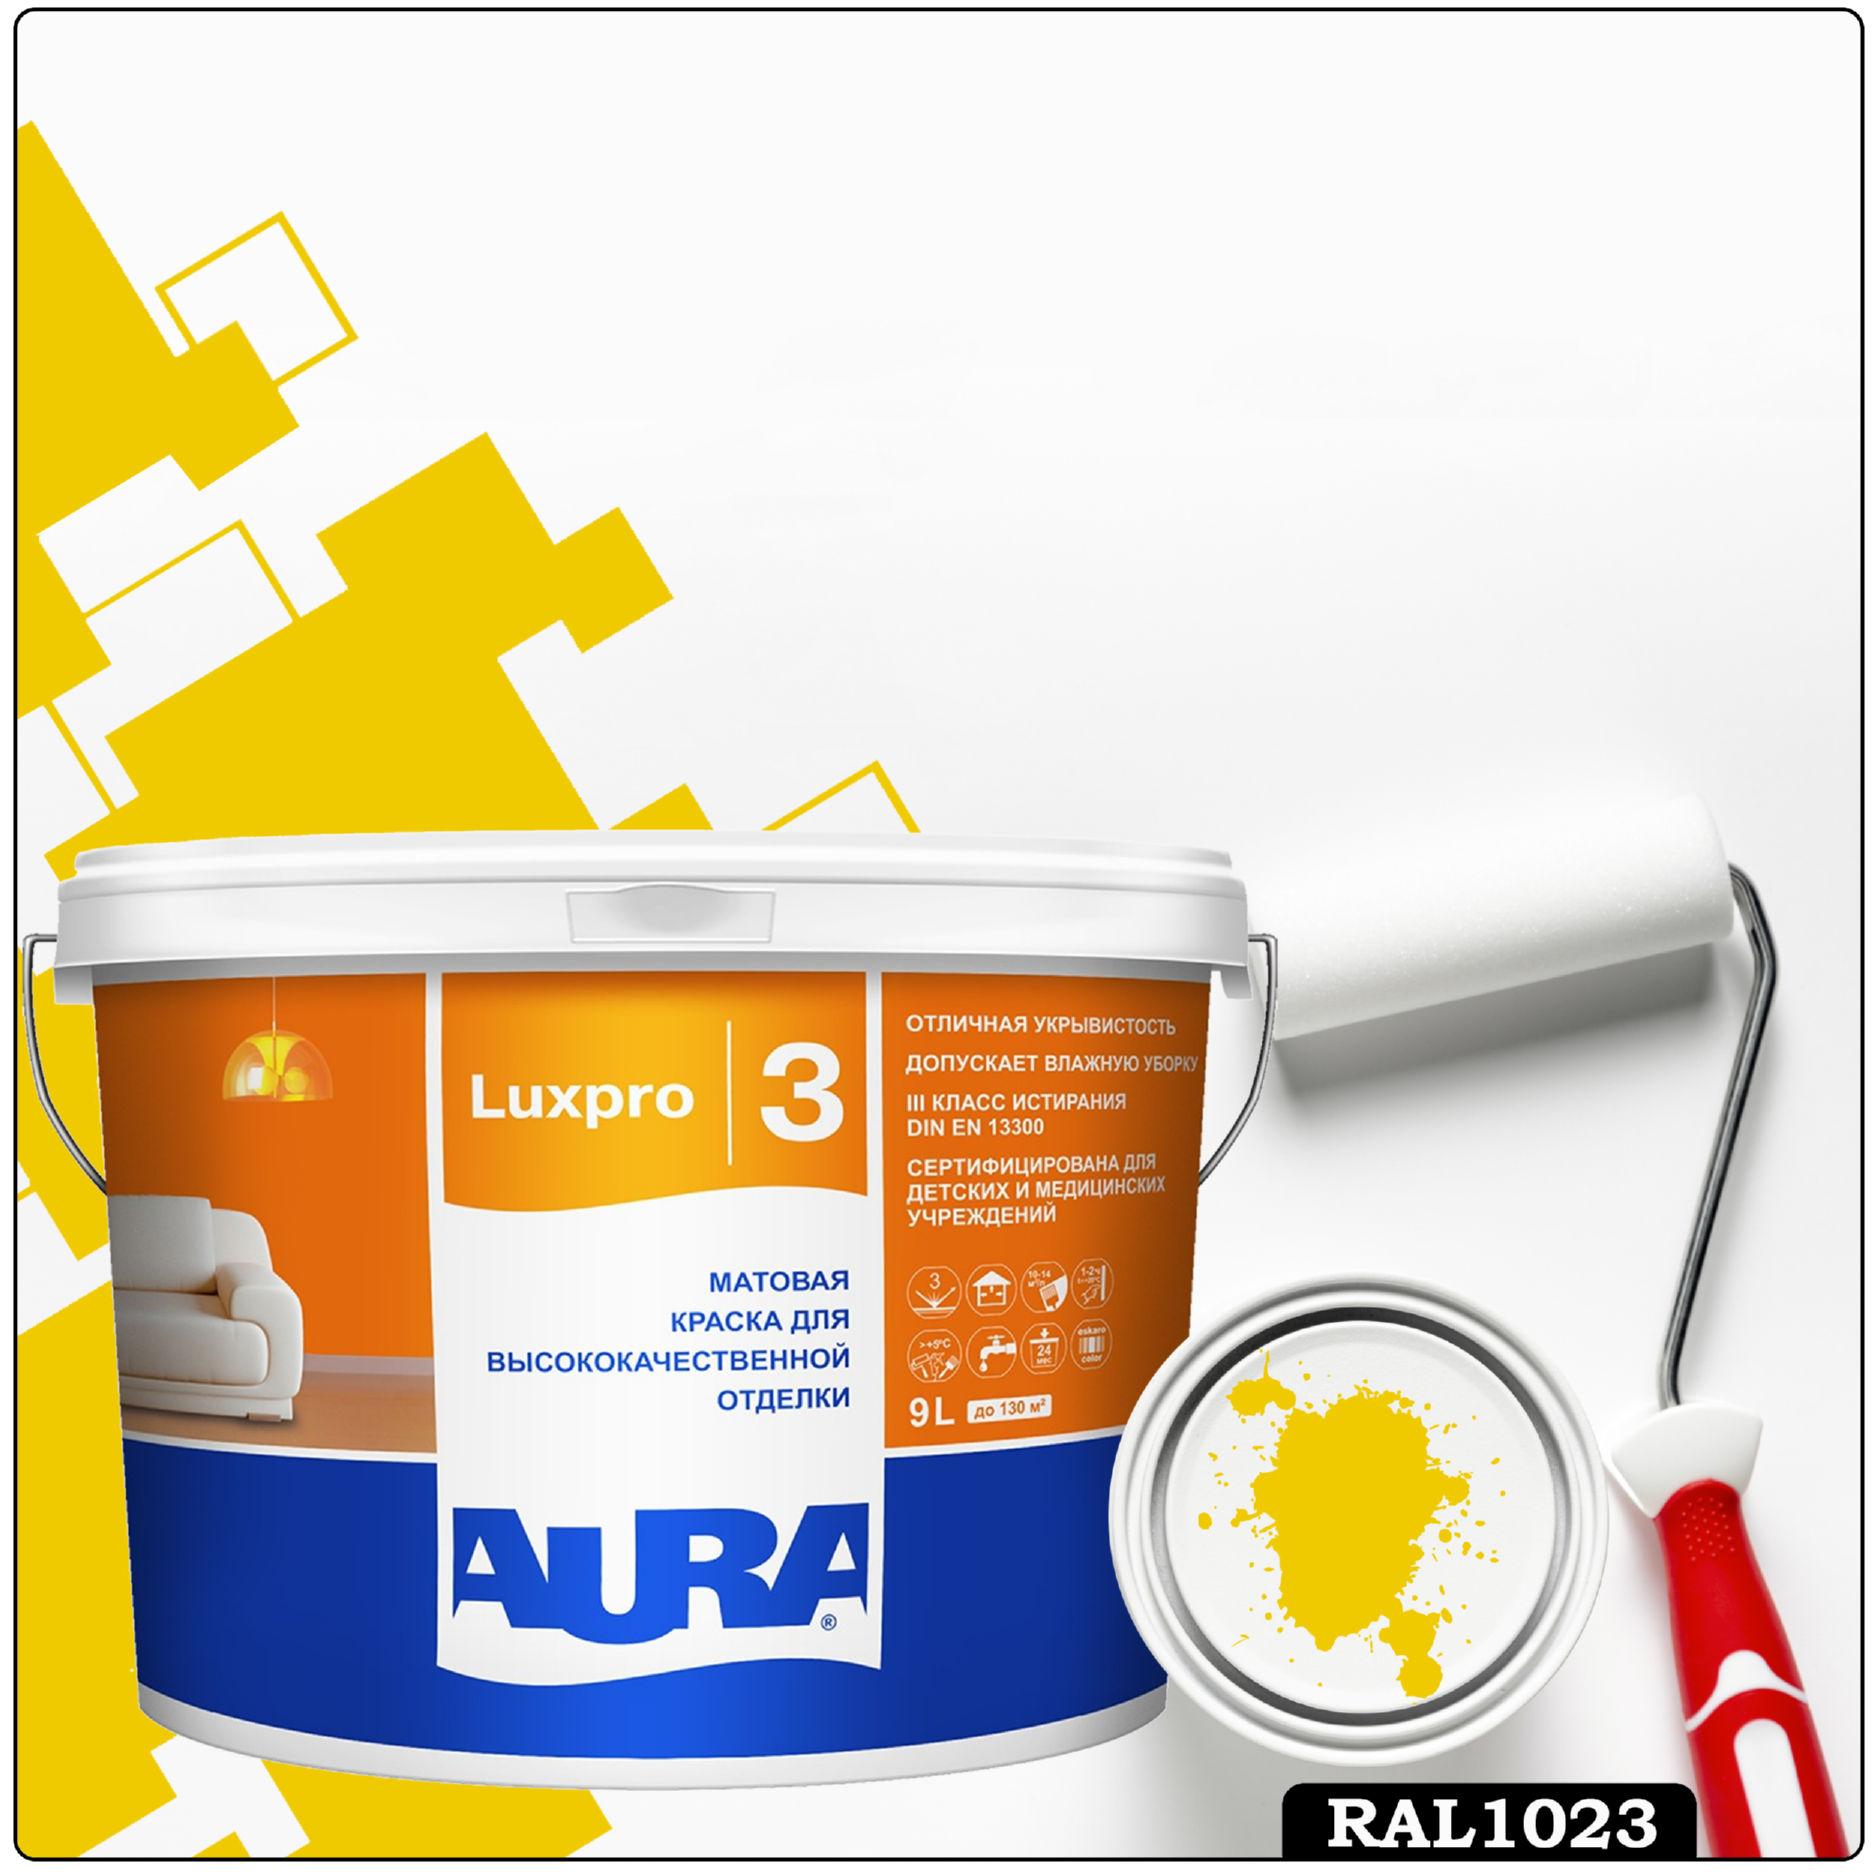 Фото 20 - Краска Aura LuxPRO 3, RAL 1023 Транспортно-жёлтый, латексная, шелково-матовая, интерьерная, 9л, Аура.